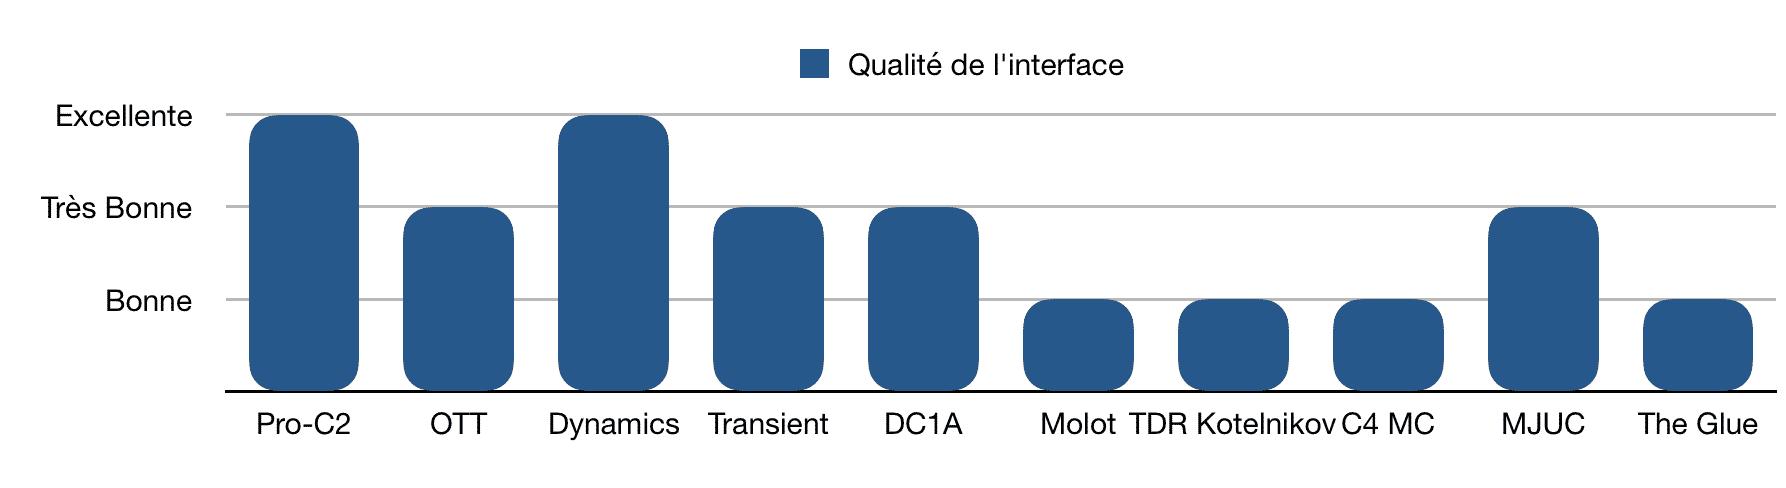 Interface - TOP 10 - Plugins - Compresseurs - WE COMPOZE